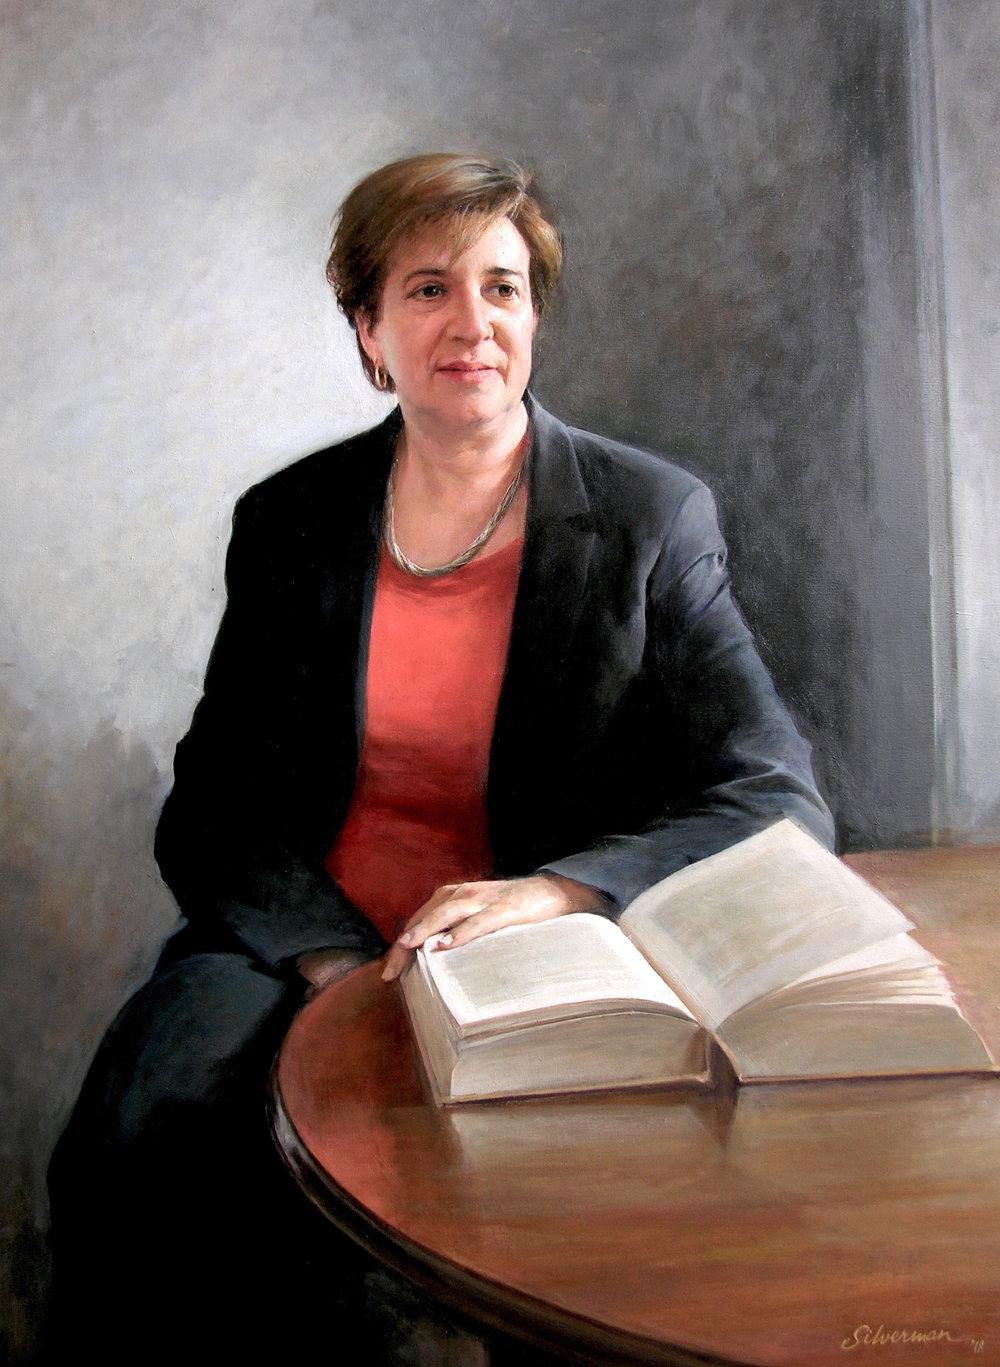 Assoc. Justice Elena Kagan, 2018